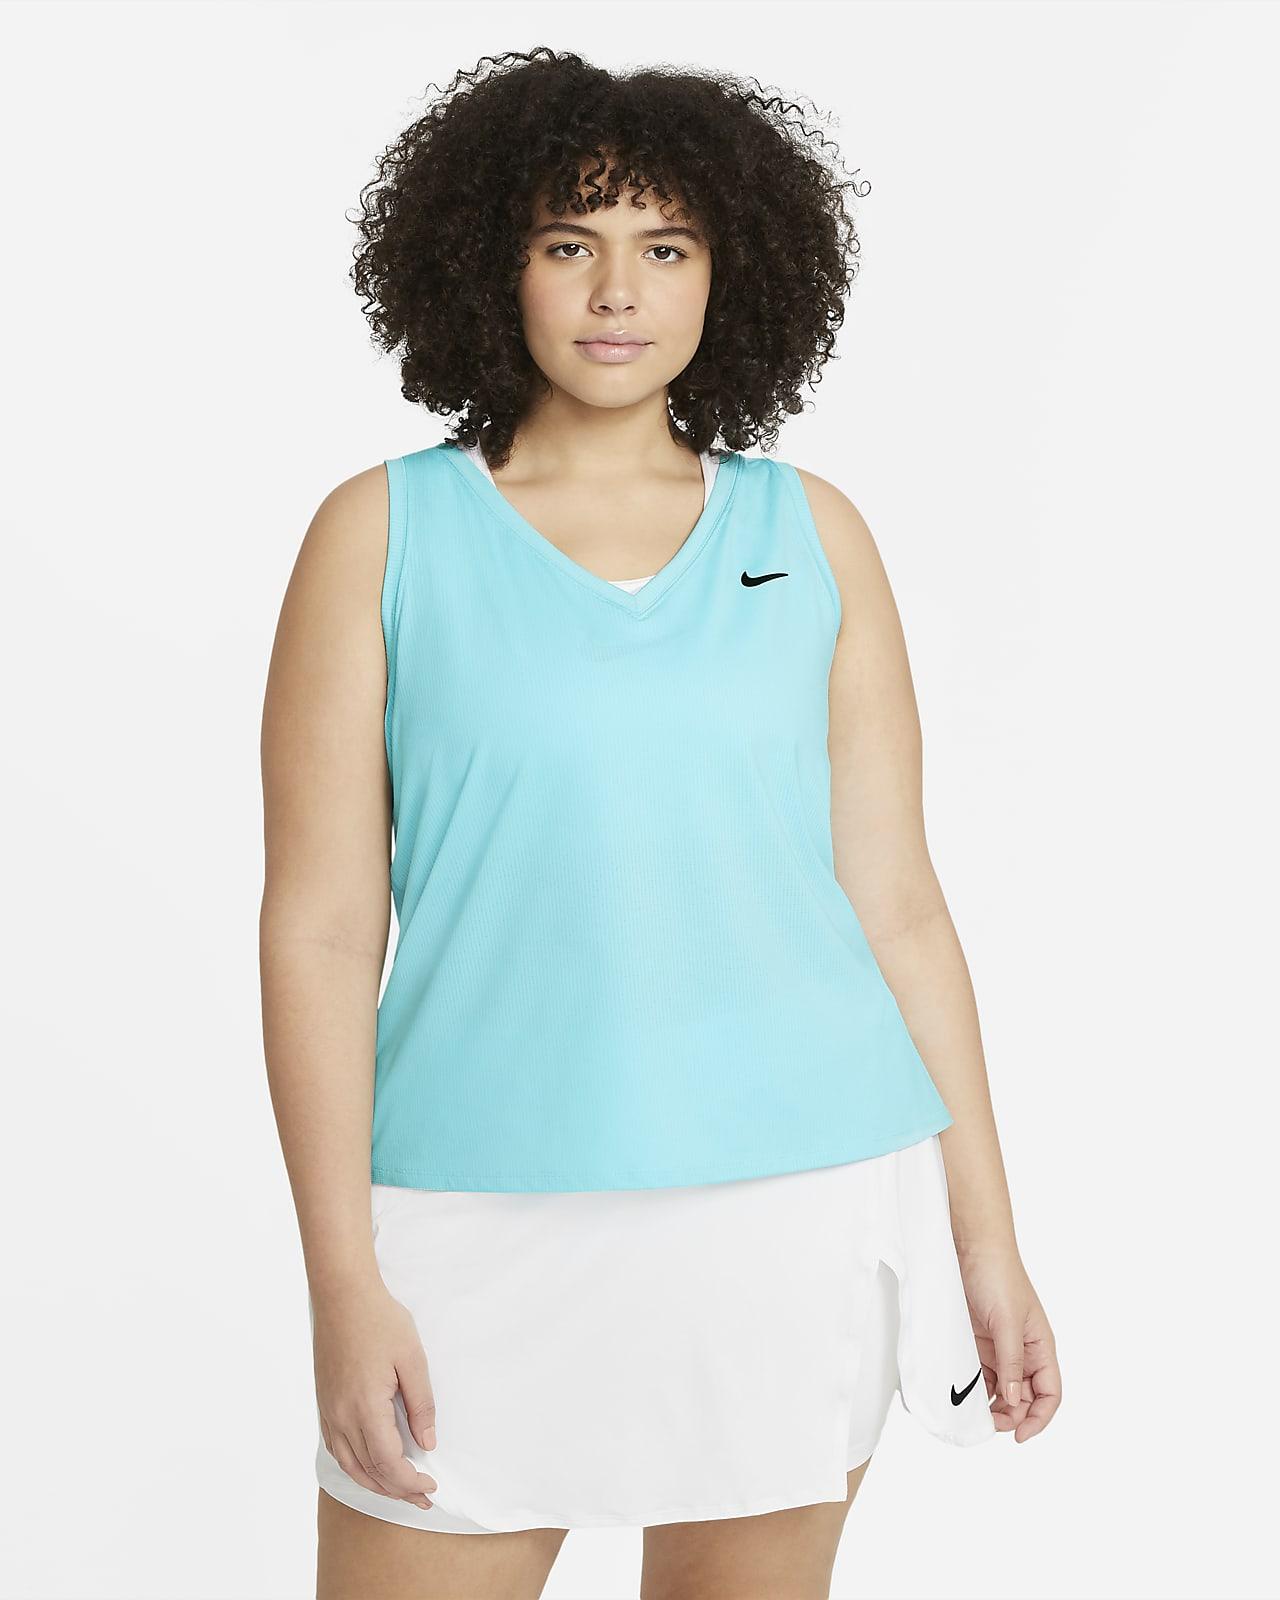 Canotta da tennis NikeCourt Victory (Plus size) - Donna